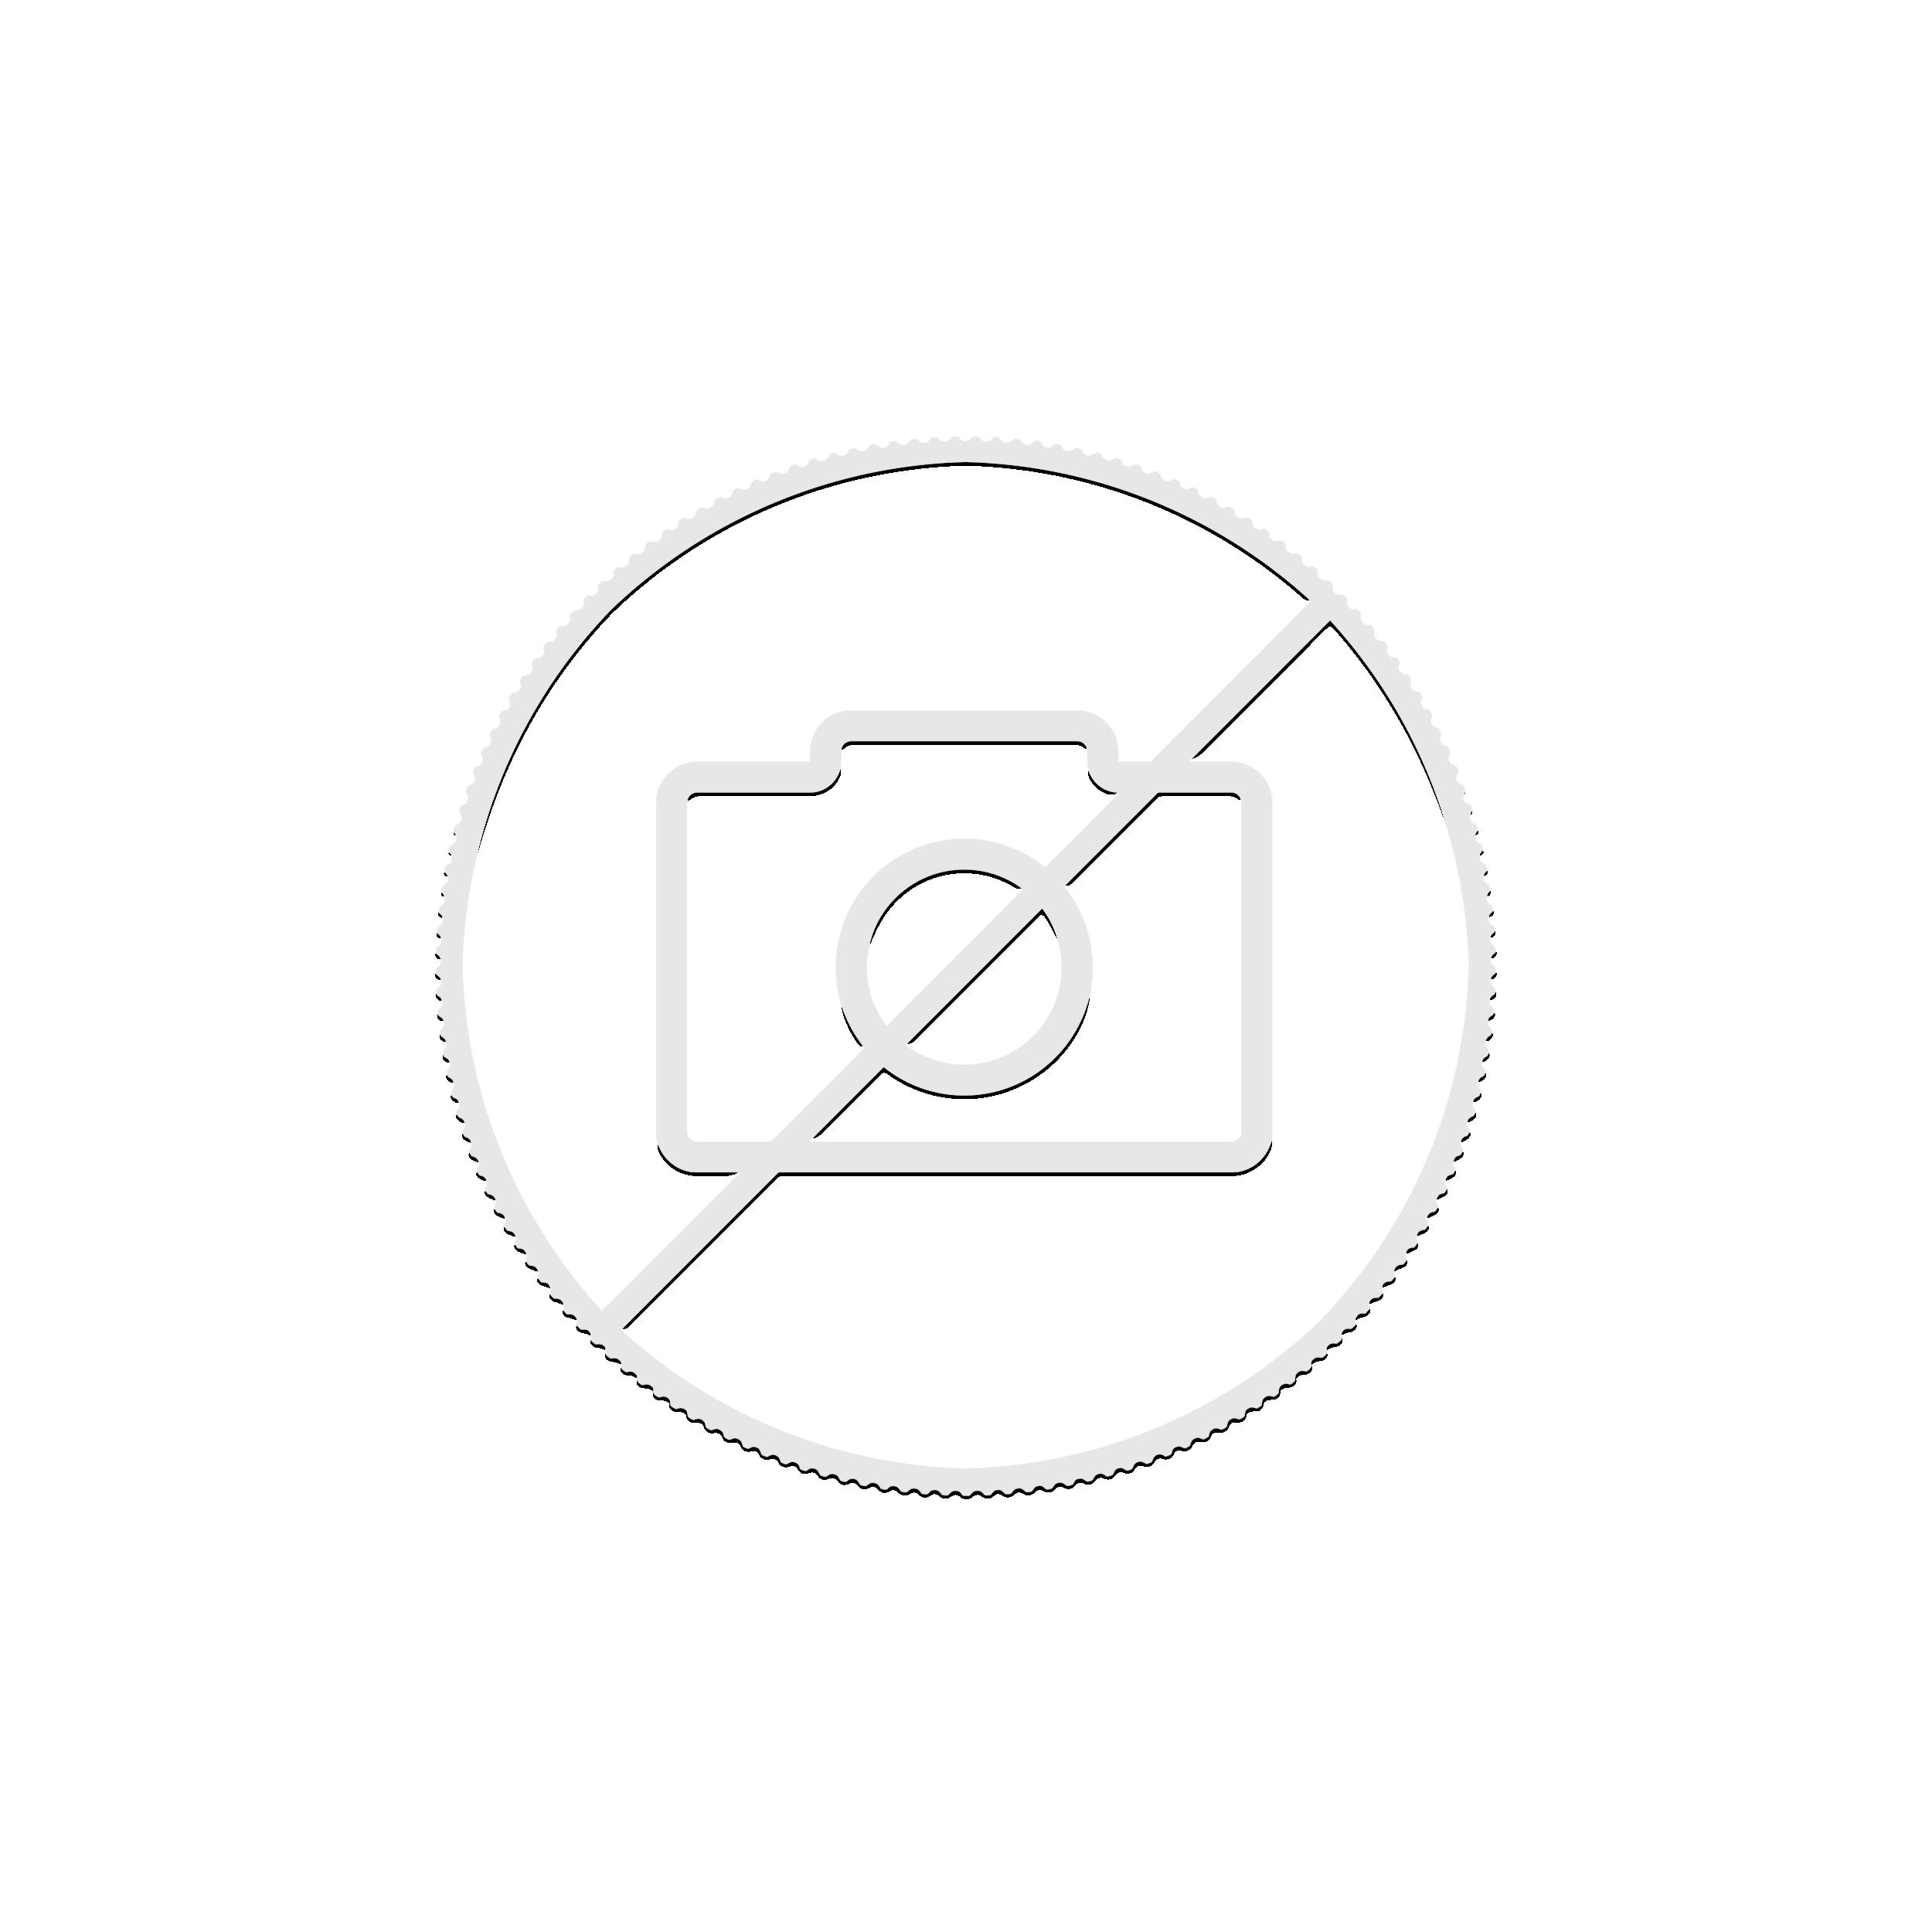 1 Troy ounce gold Philharmonic coin